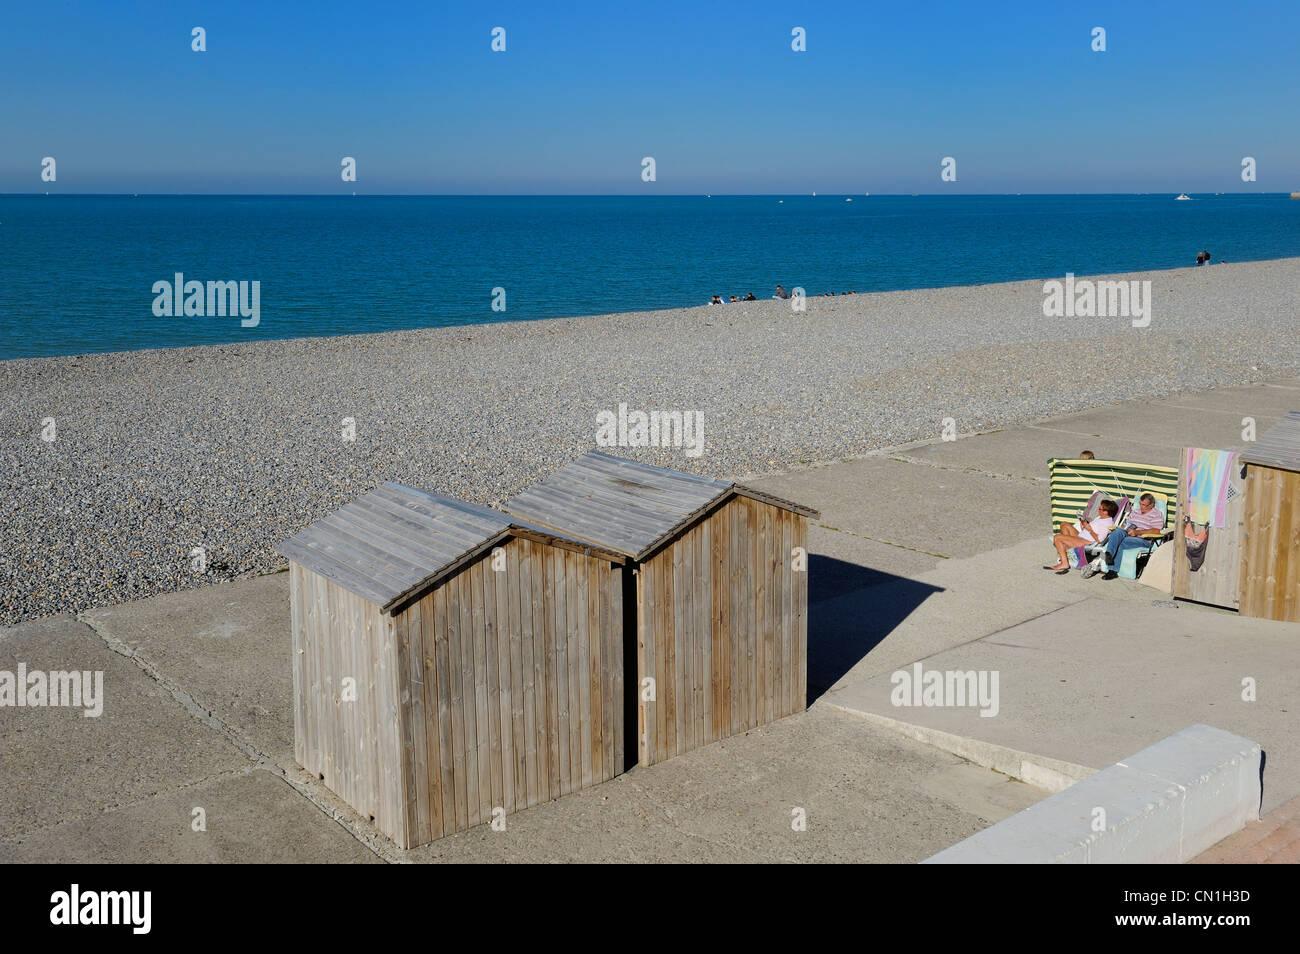 France, Seine Maritime, Dieppe, the pebble beach - Stock Image